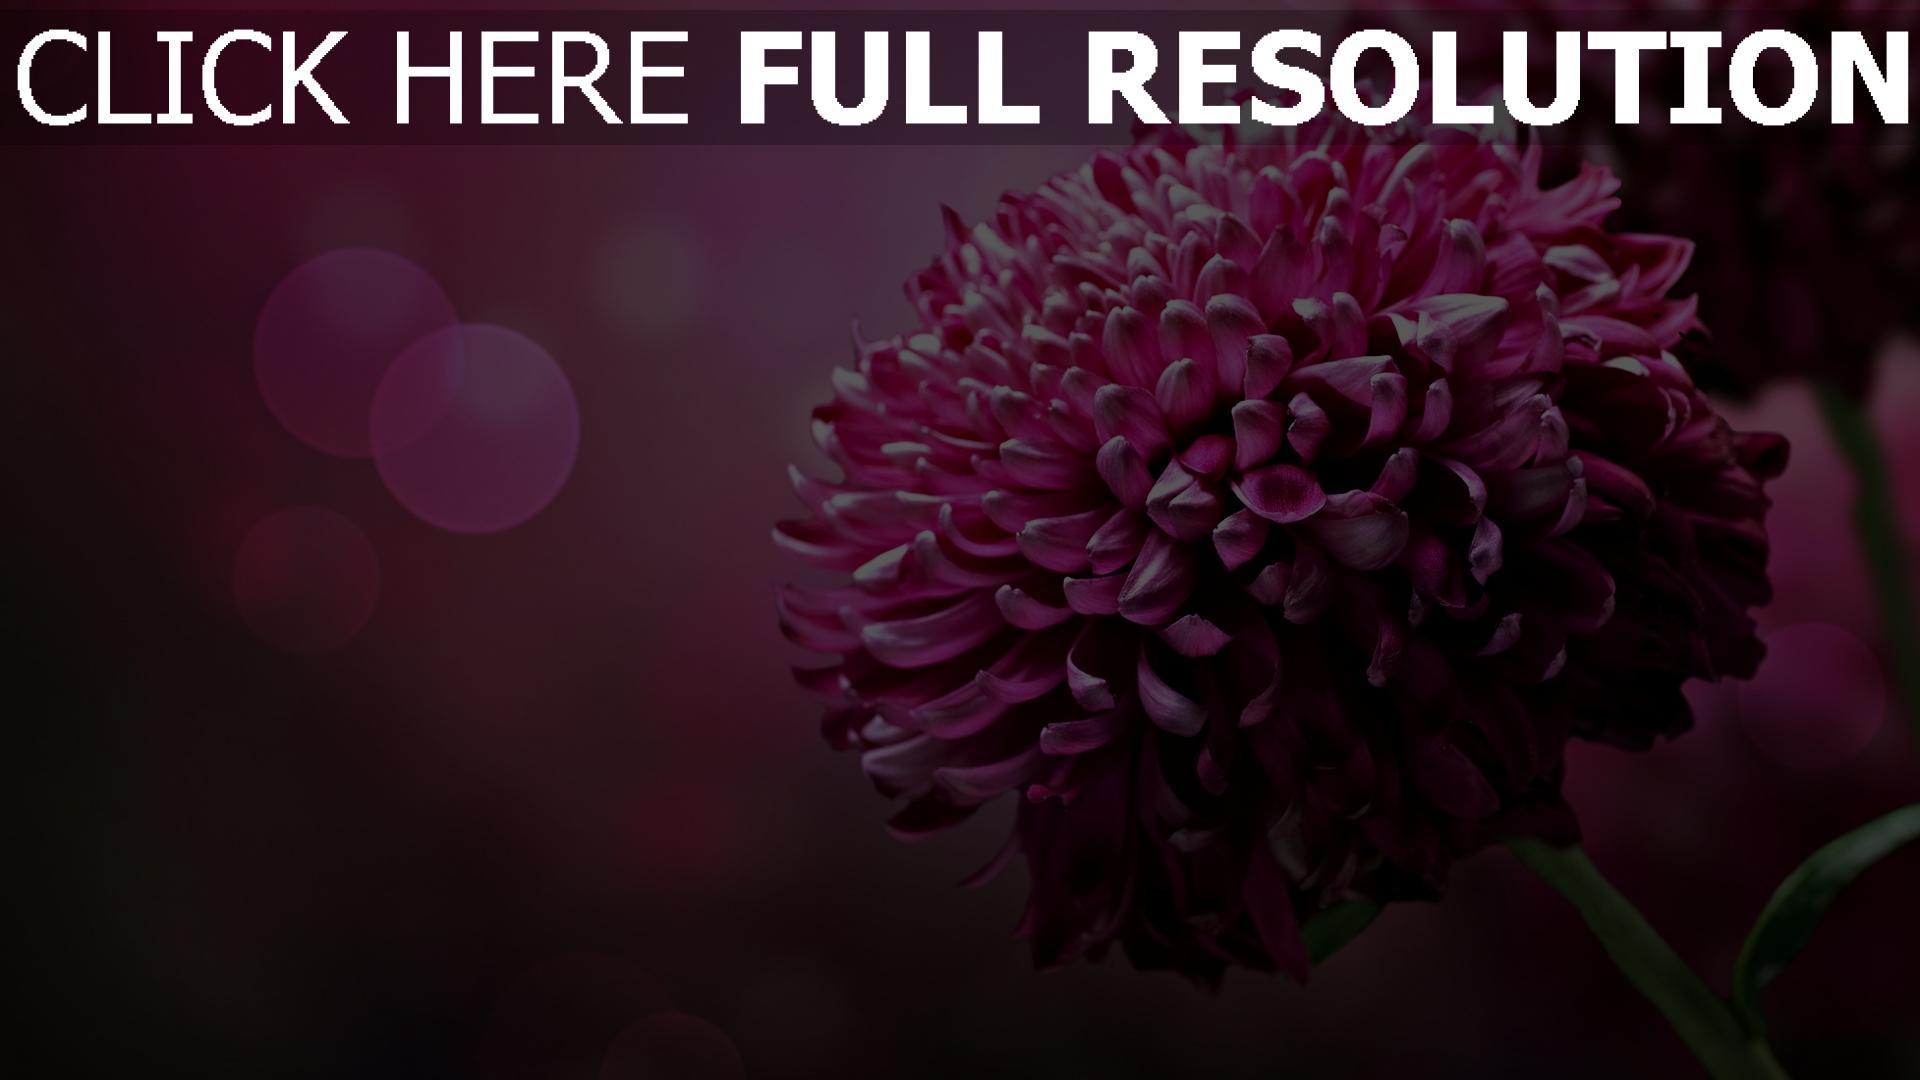 Hd Hintergrundbilder Chrysantheme Rosa Lila Blume Bokeh Desktop